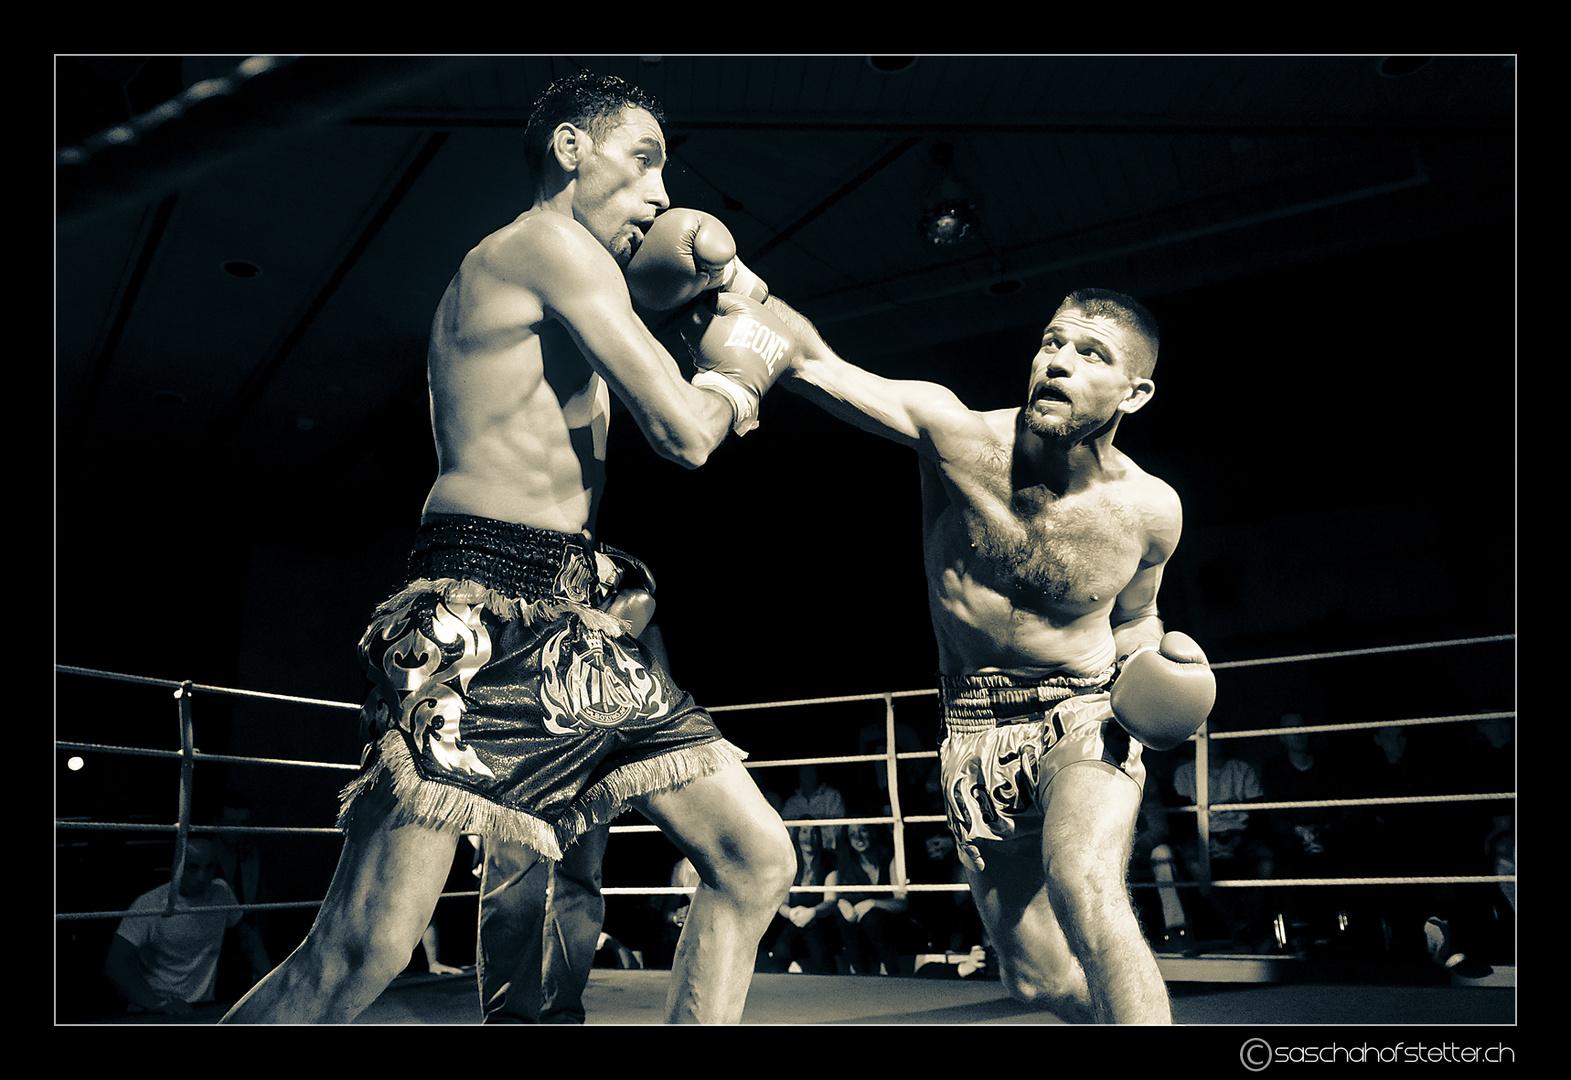 Thaibox Champ - Martino Ciano